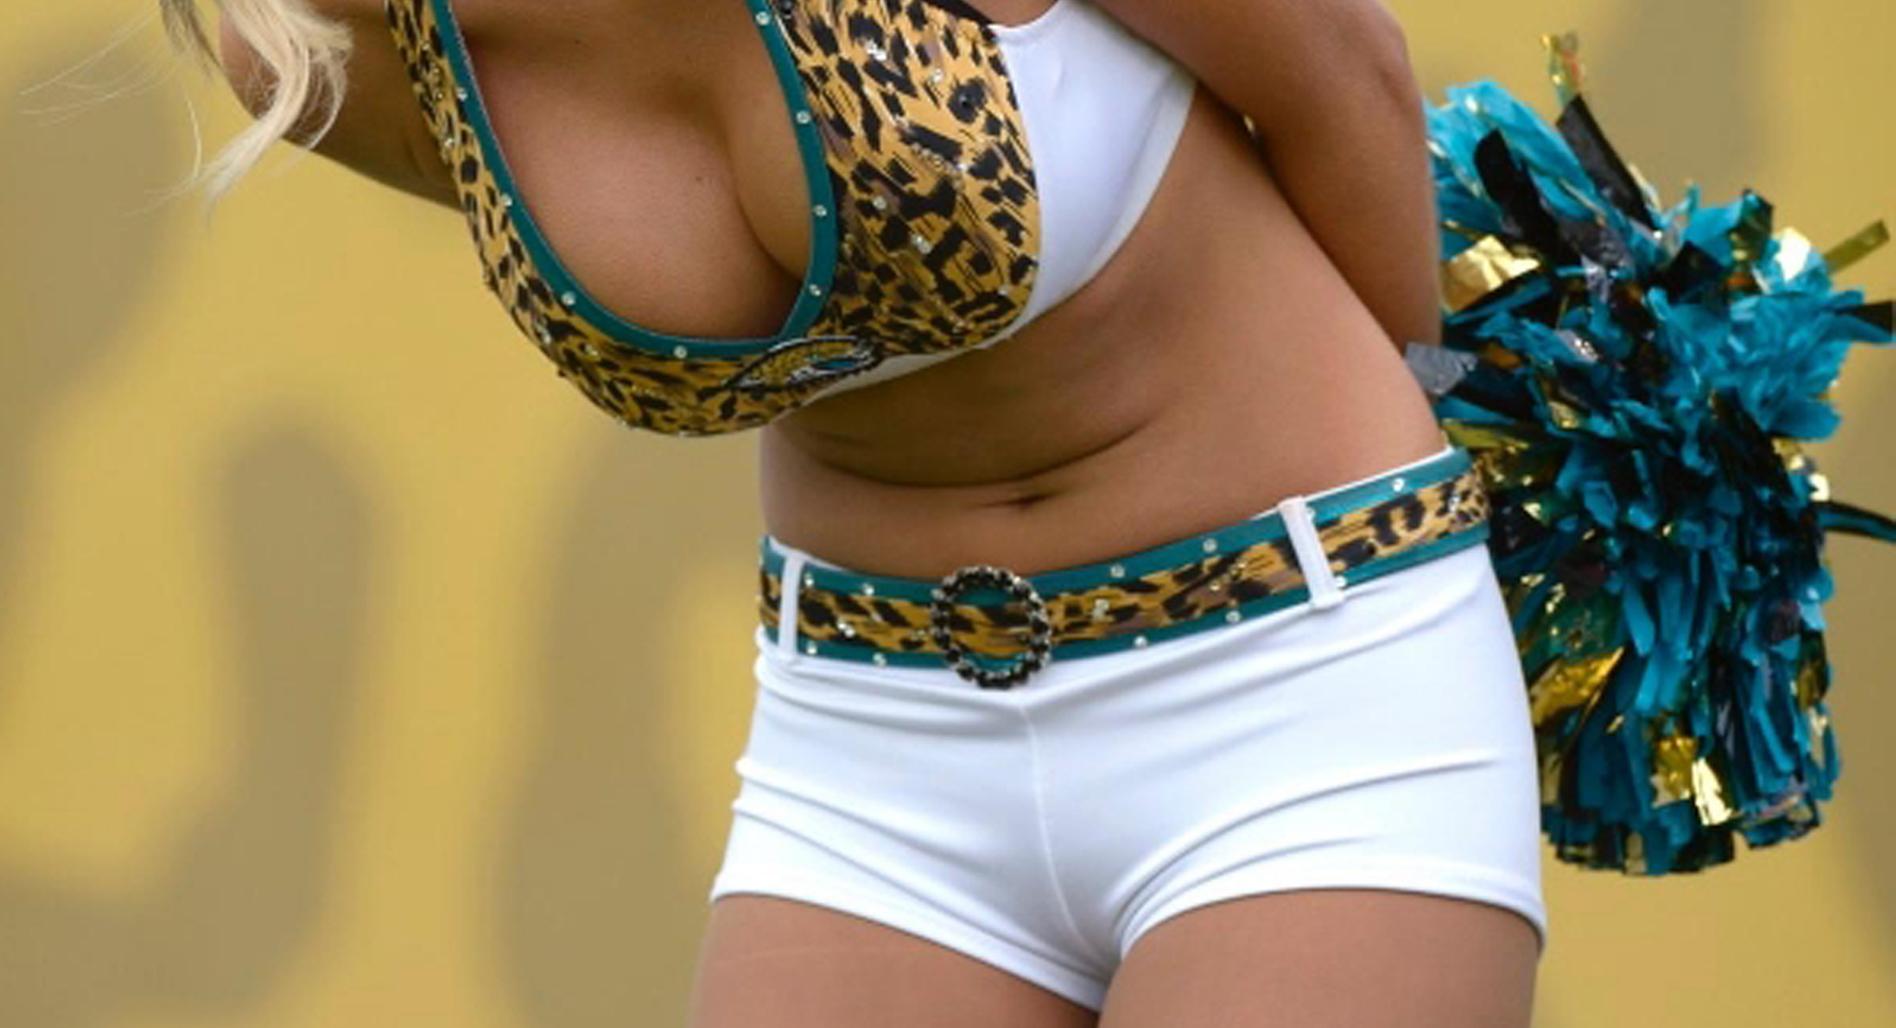 The world's sexiest Cheerleaders